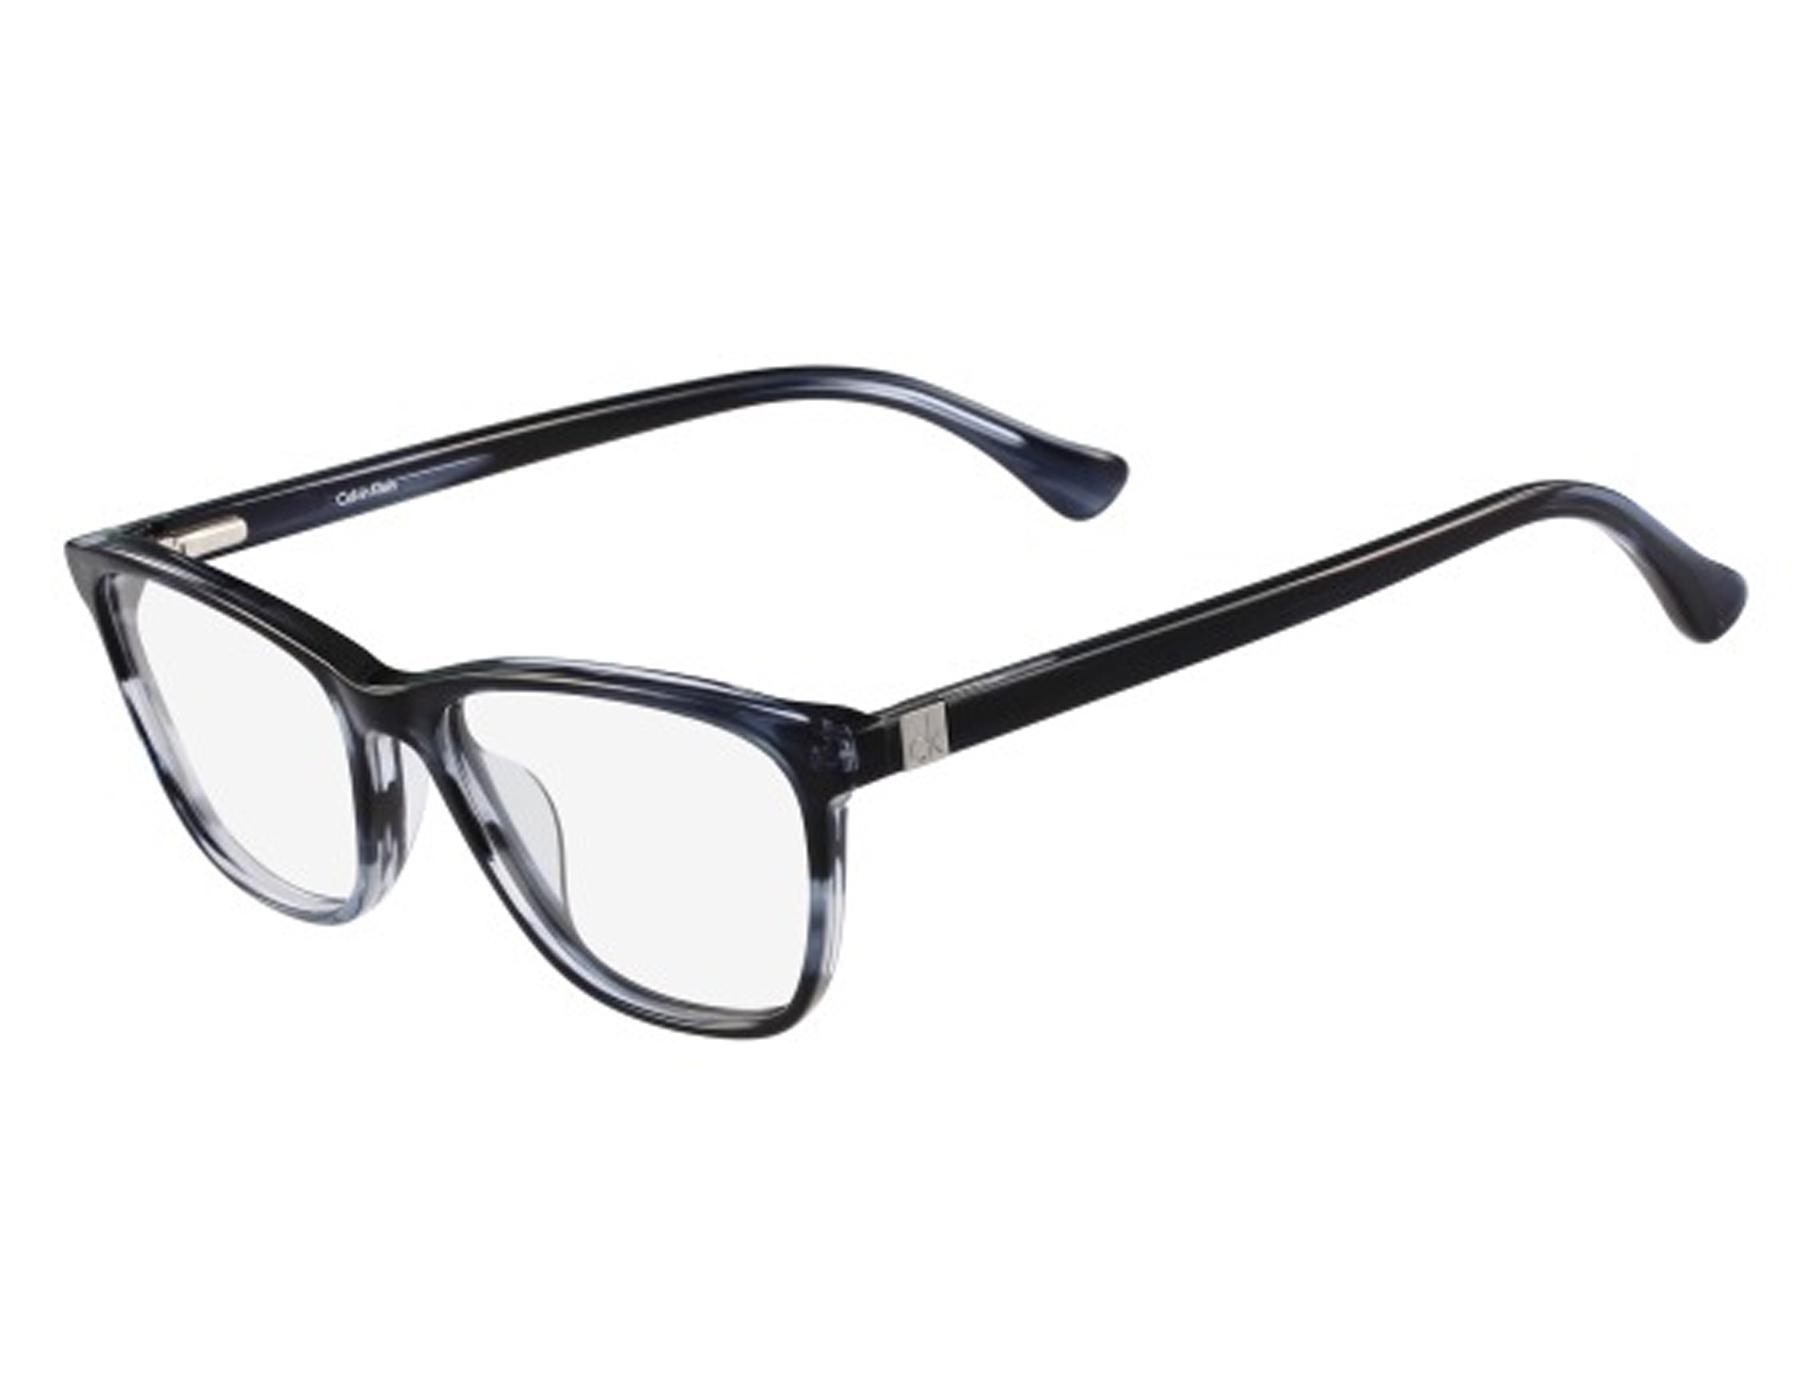 13f5e688c0 NEW Calvin Klein CK5883 416 54mm Striped Blue Optical Eyeglasses ...